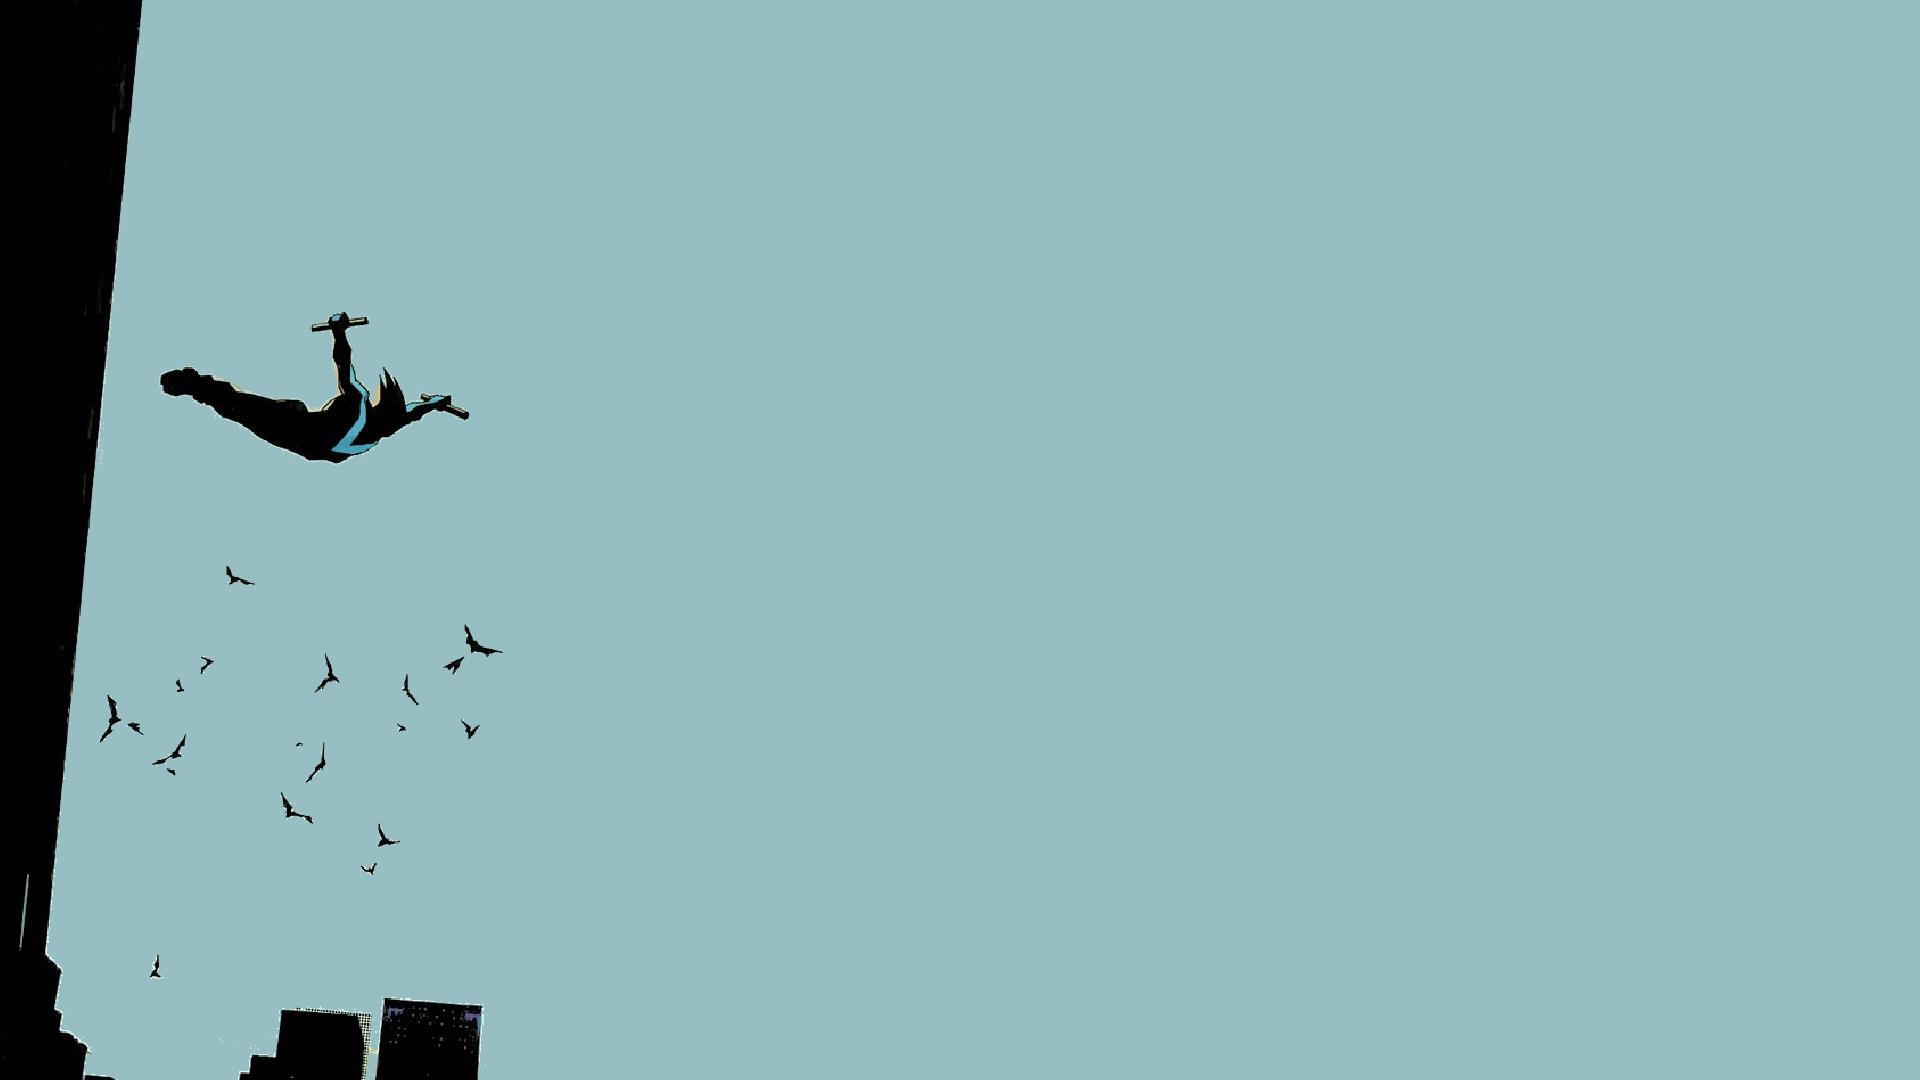 Nightwing Wallpaper Iphone Comics   nightwing wallpaper 1920x1080